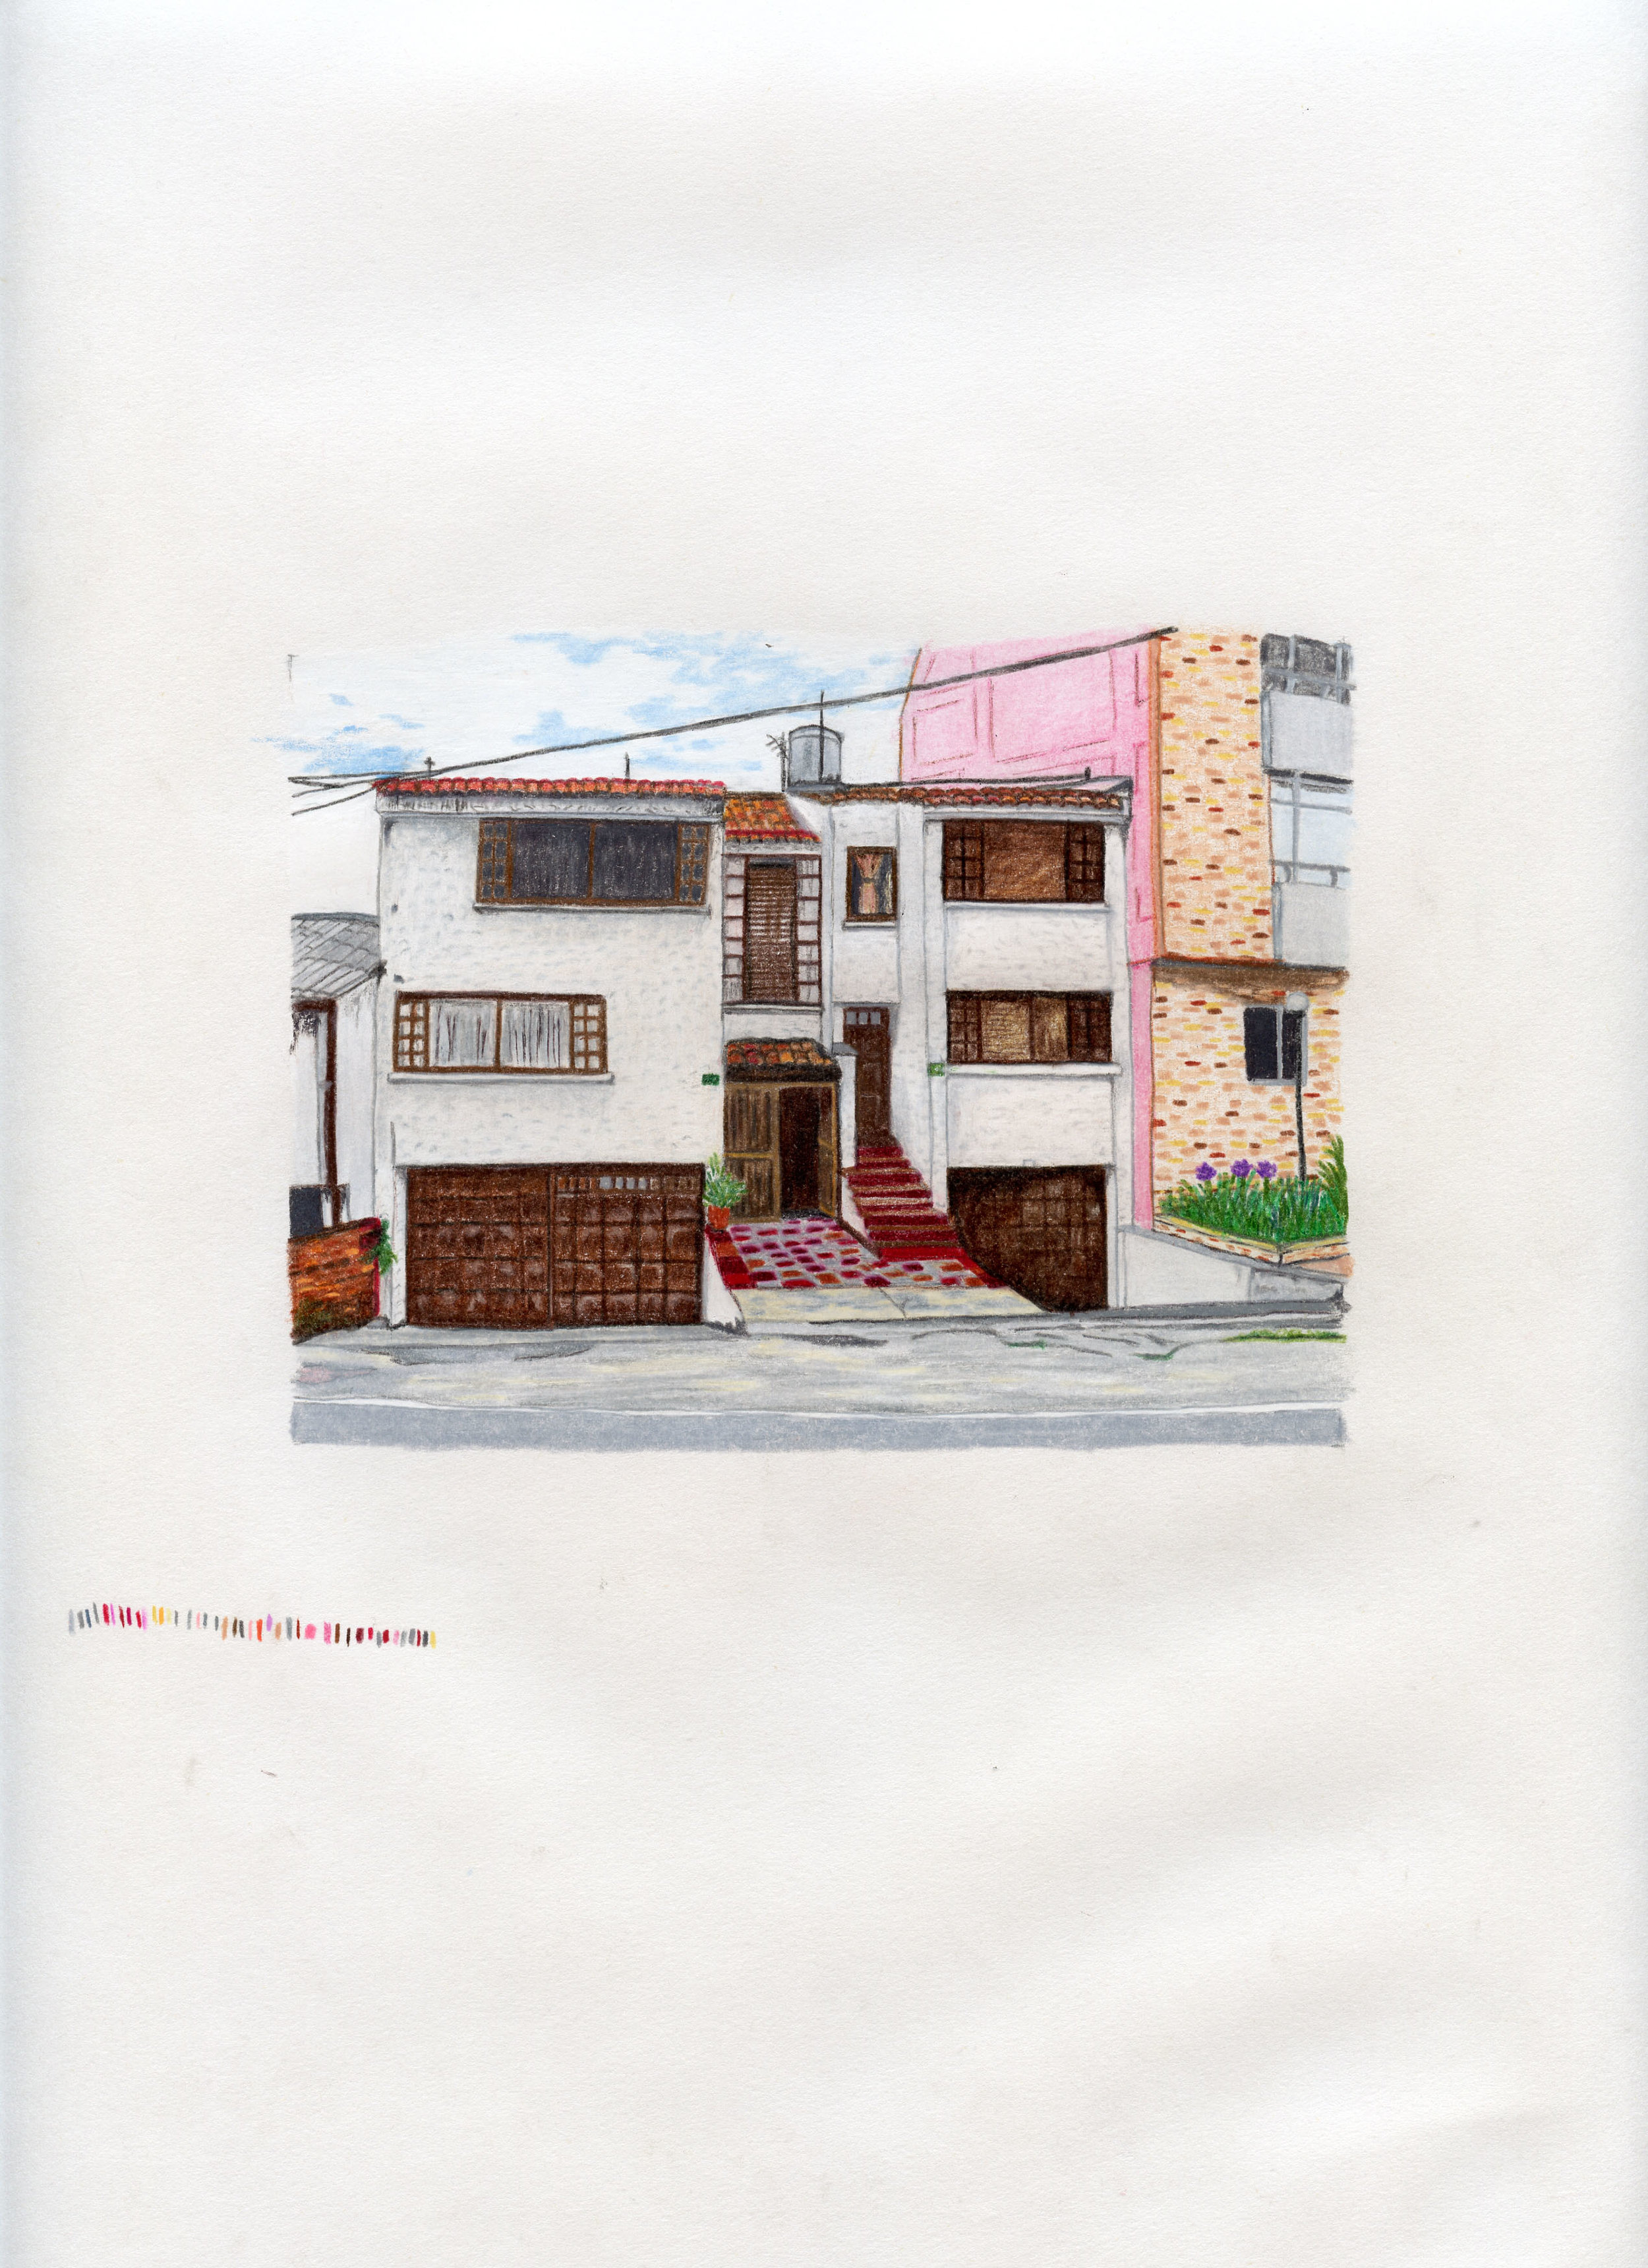 """Estudios de caso"" | Lápices de colores sobre papel | 25 x 35 cm | Serie de 20 dibujos | 2010 - 2015"